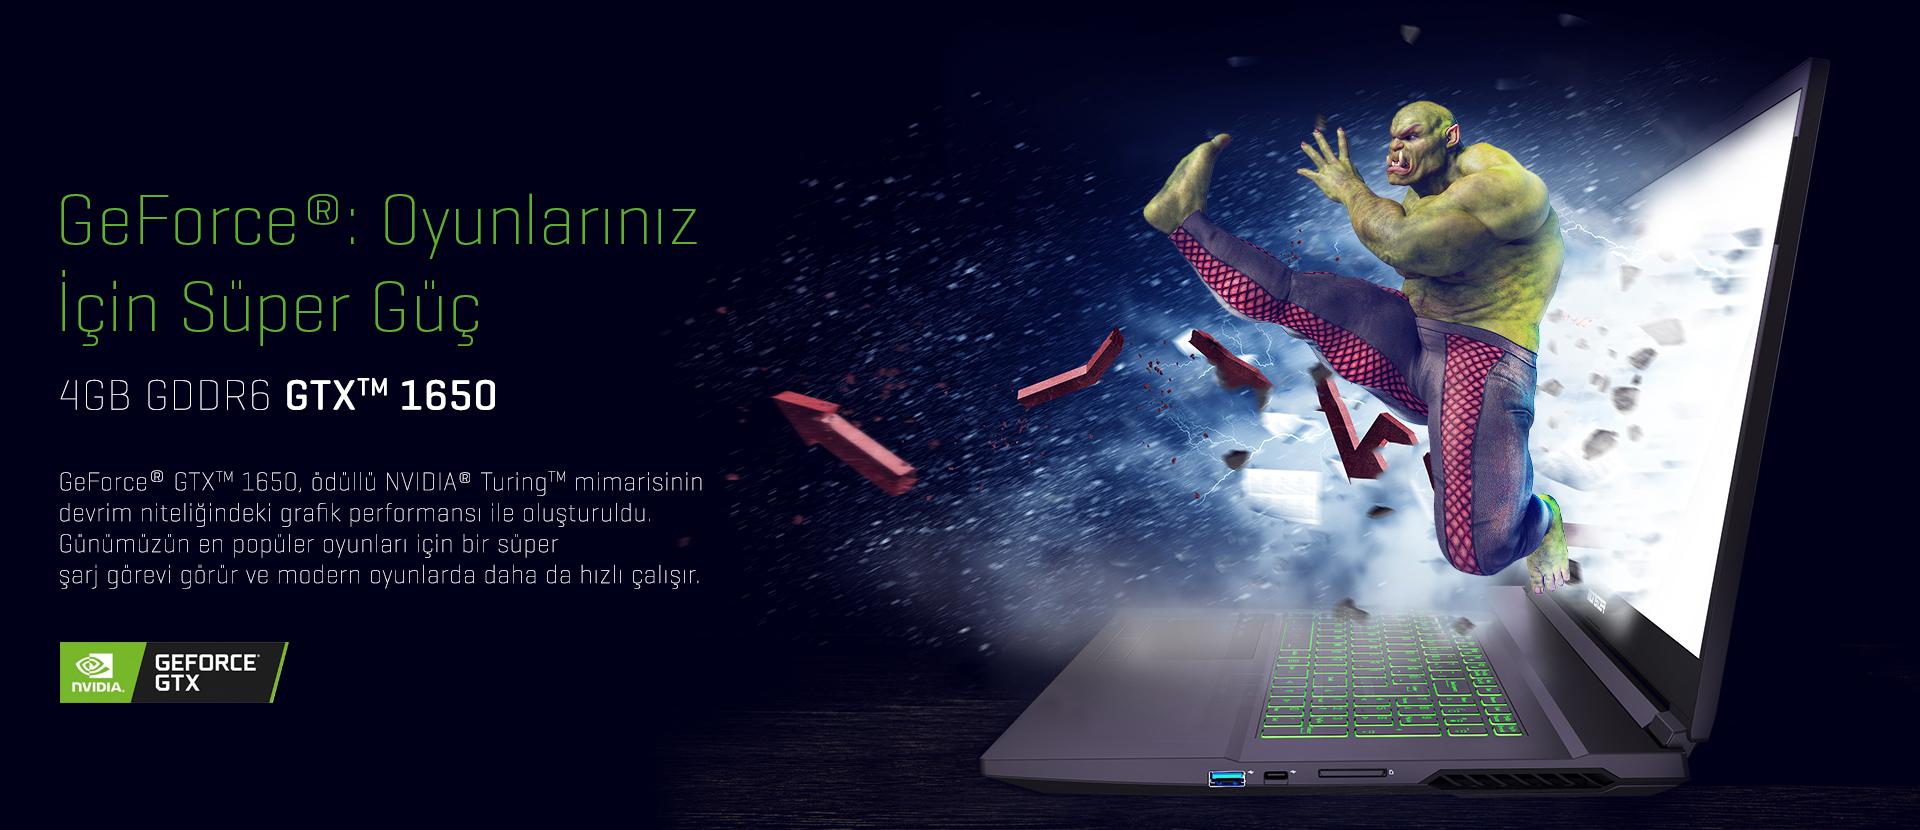 Monster Notebook Abra A7 V12 1